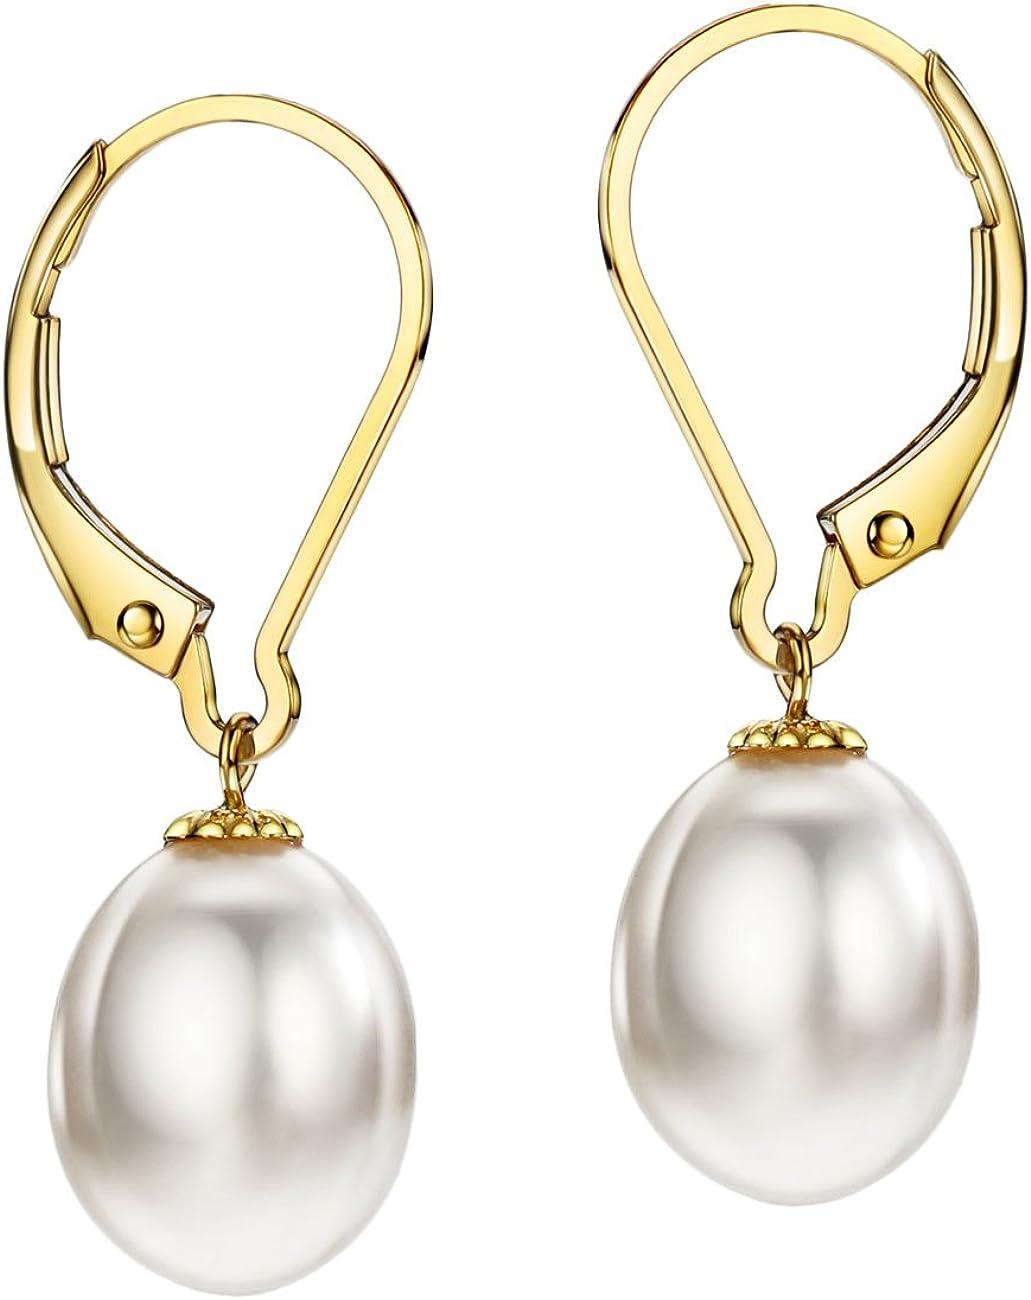 18K Gold Freshwater Cultured Pearl Drop Dangle Earrings Leverback 8-9mm Pearl Jewelry for Women